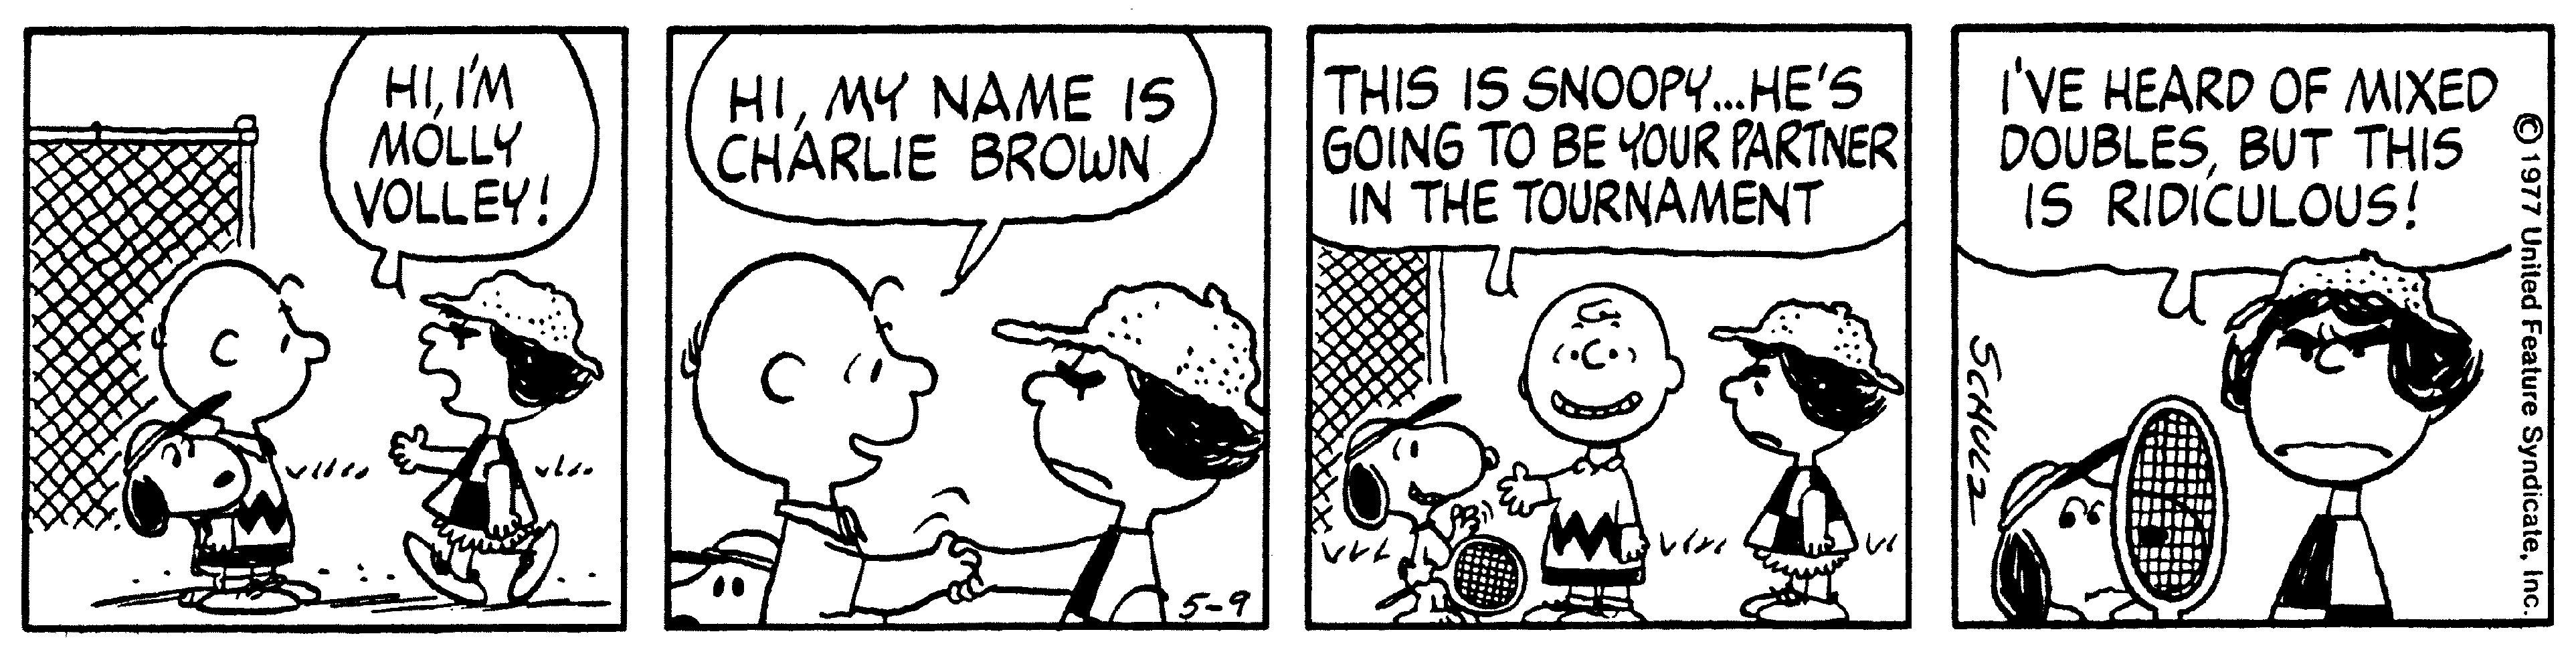 Charlie brown sex cartoon